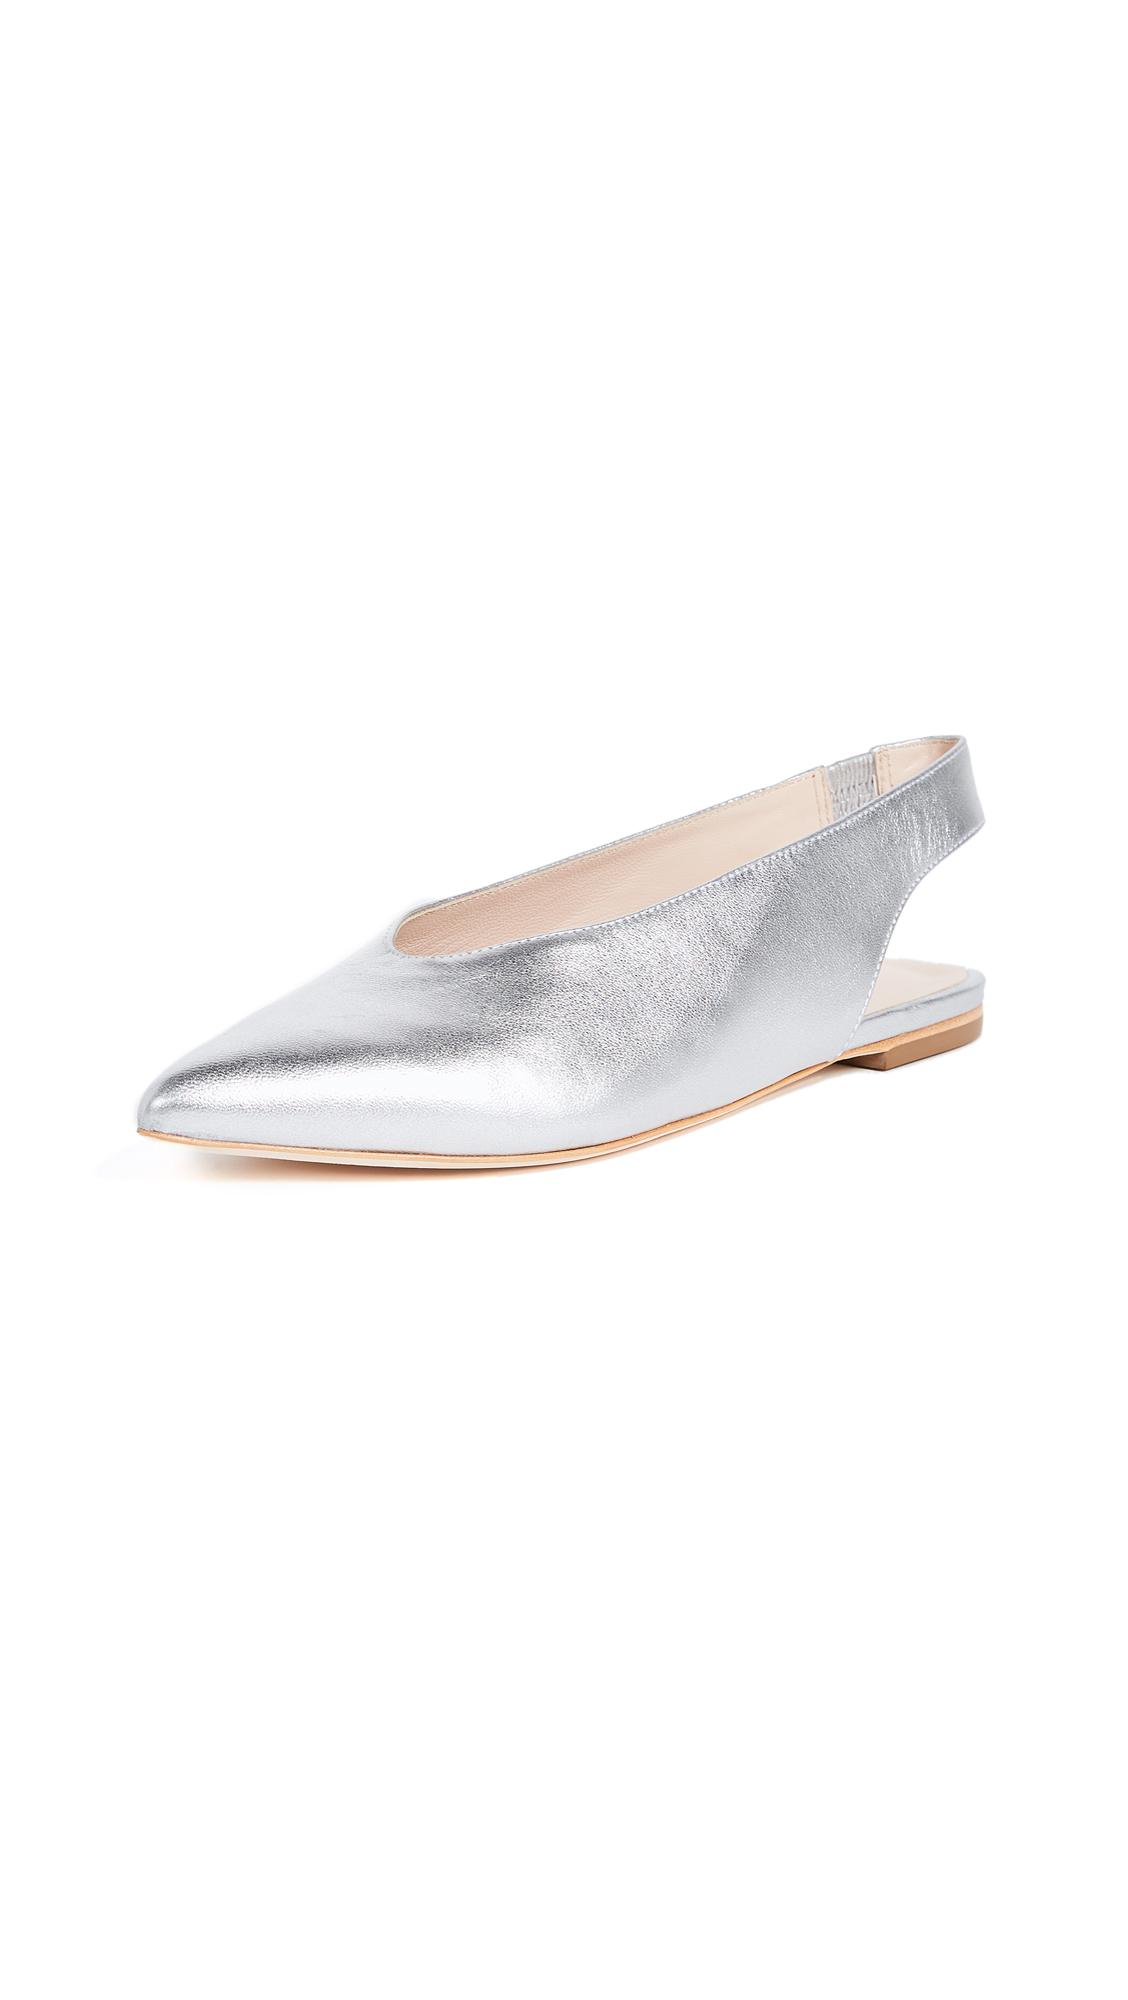 Loeffler Randall Eve Slingback Flats - Silver